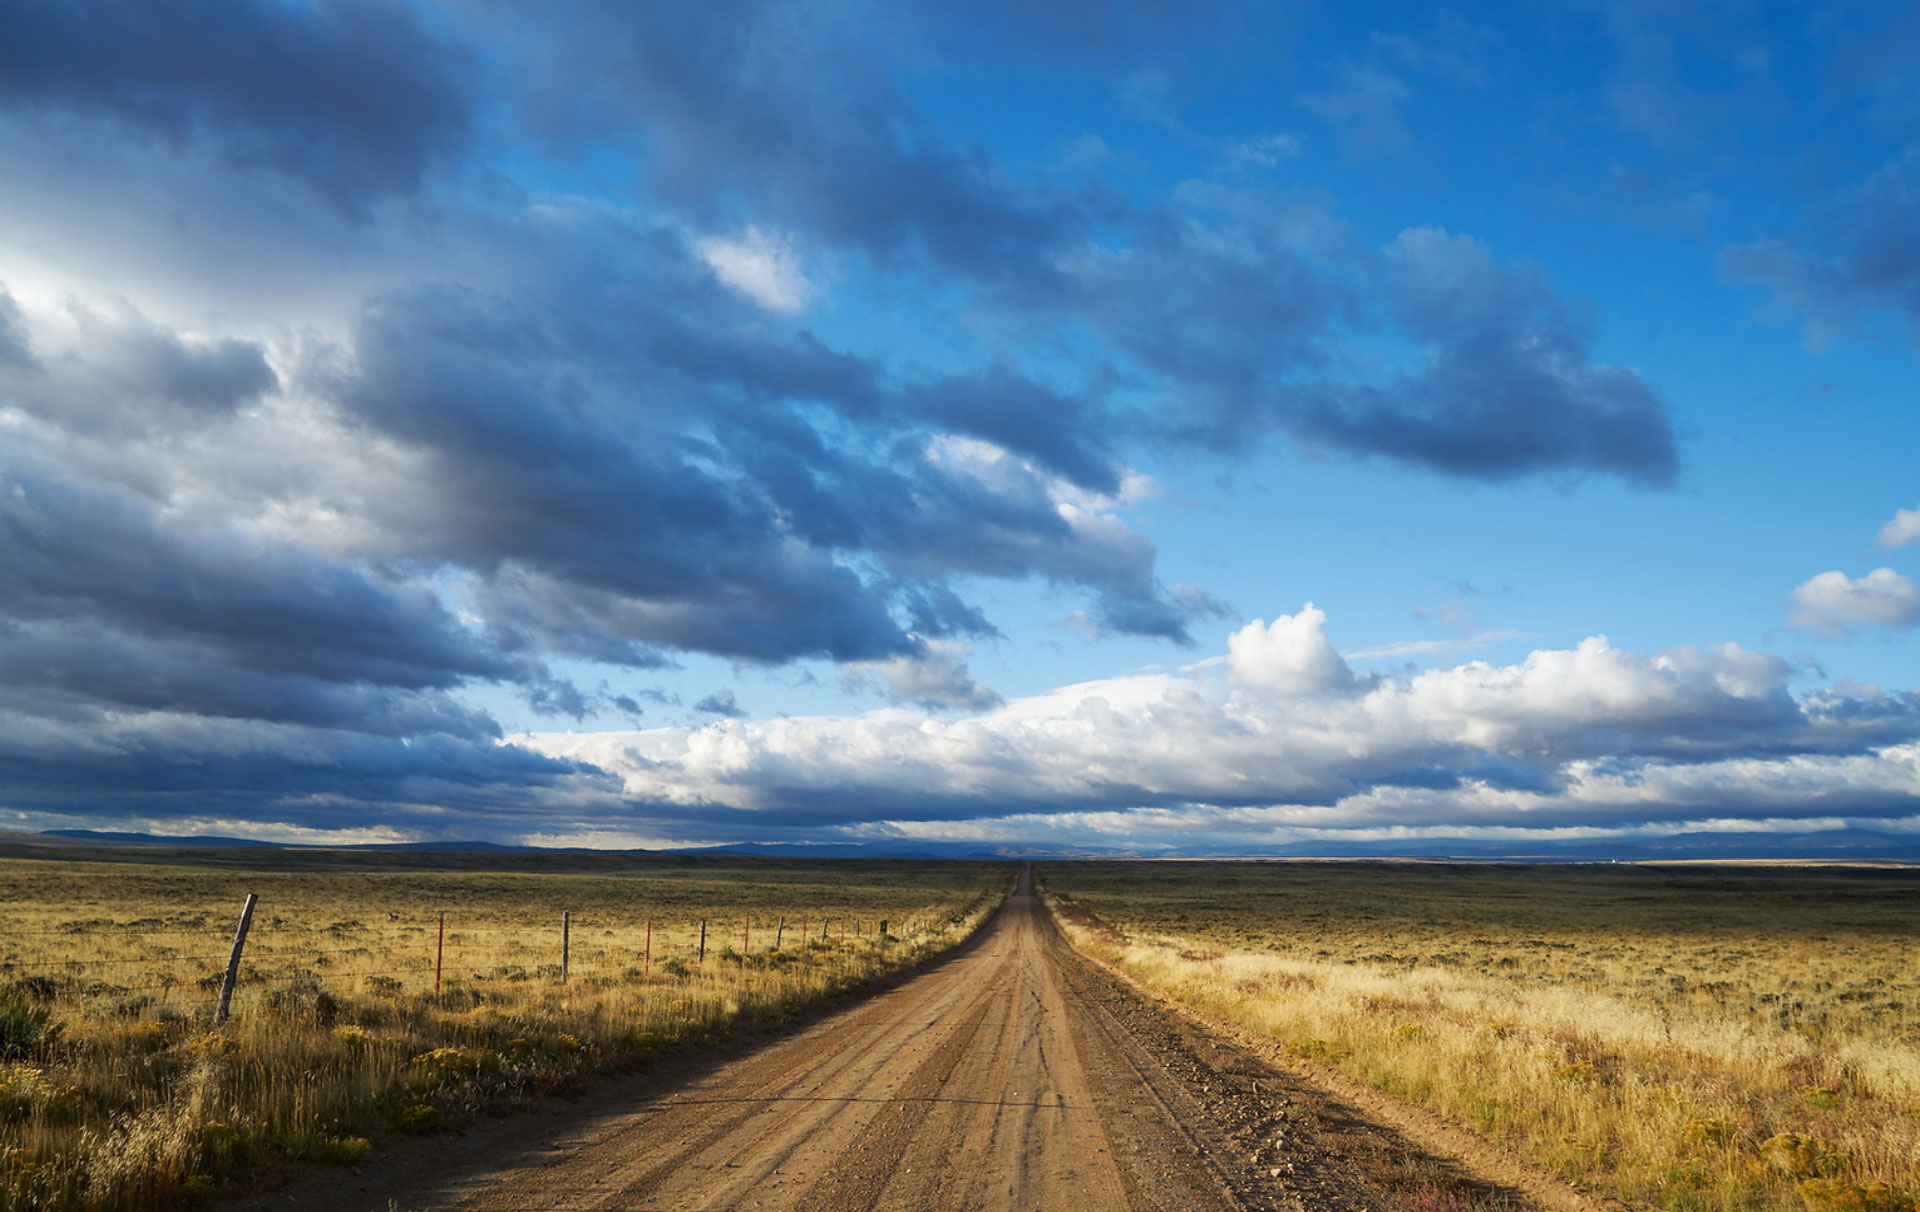 ALL 50 STATES - Outside Saratoga, Wyoming ©Tony Gale Photography